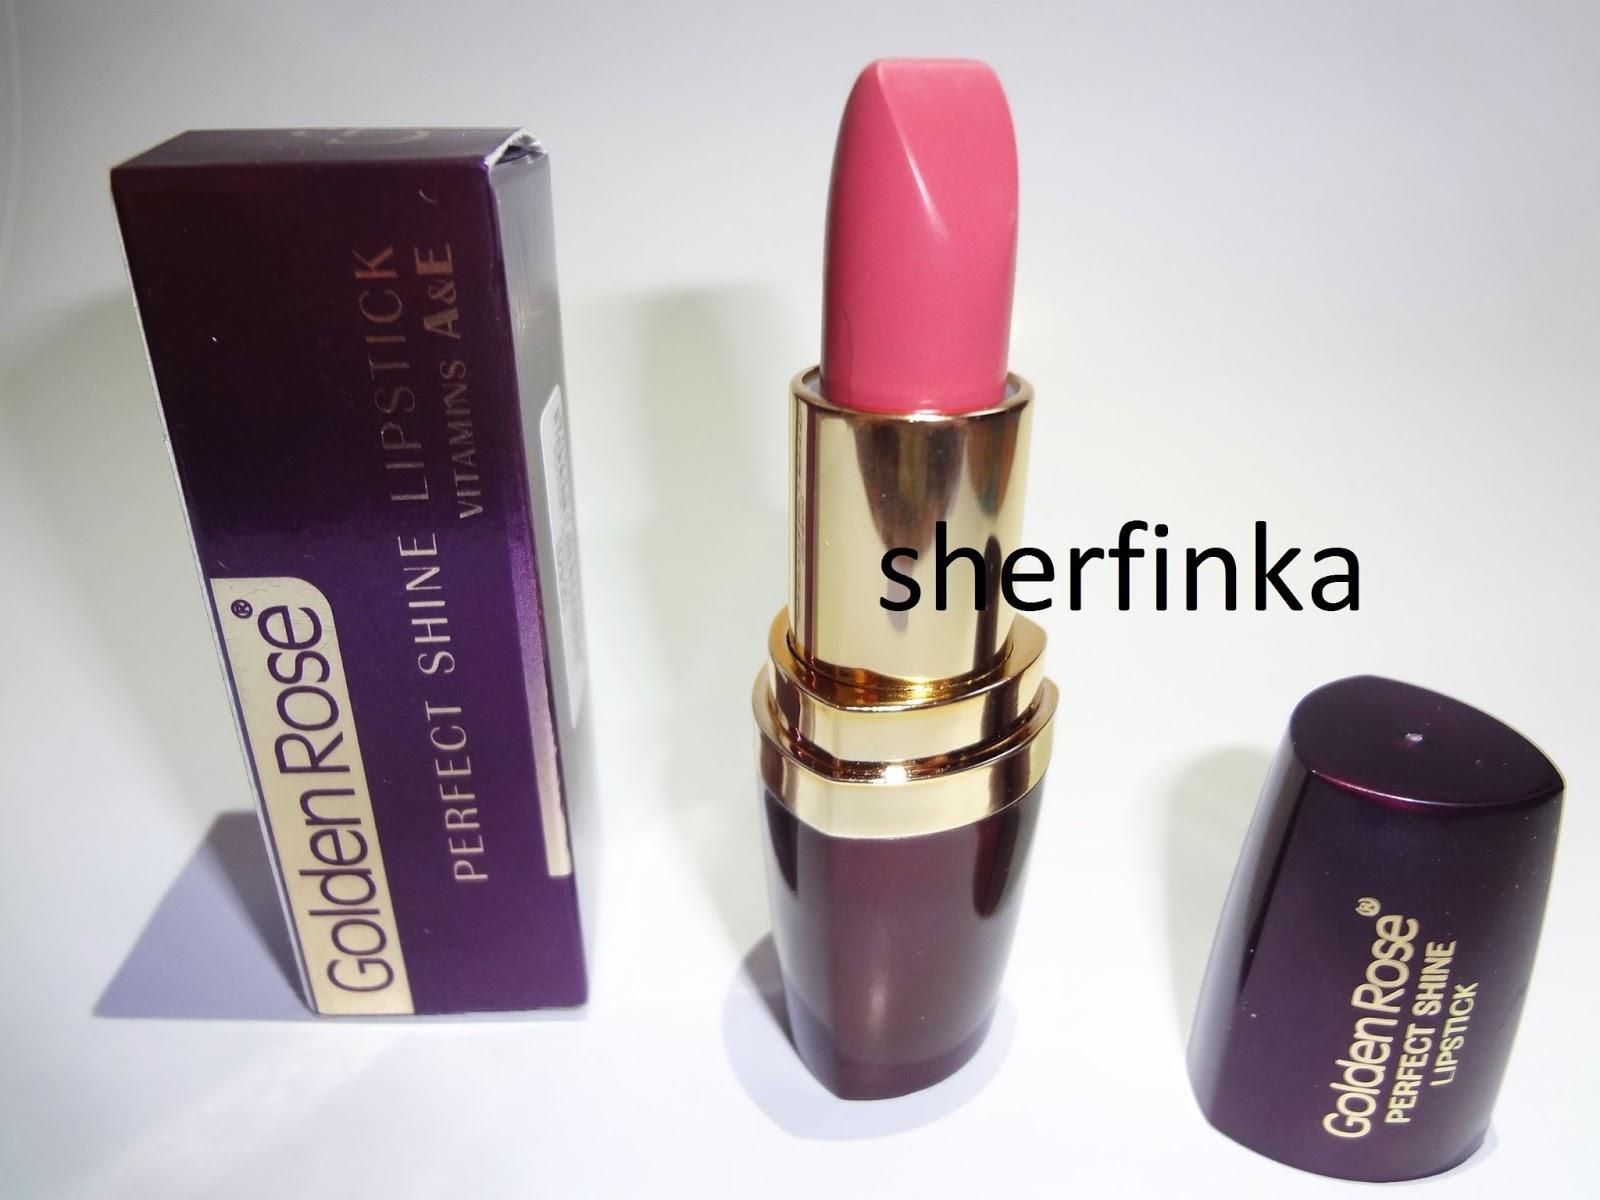 Sherfinka Golden Rose Perfect Shine Lipstick 240